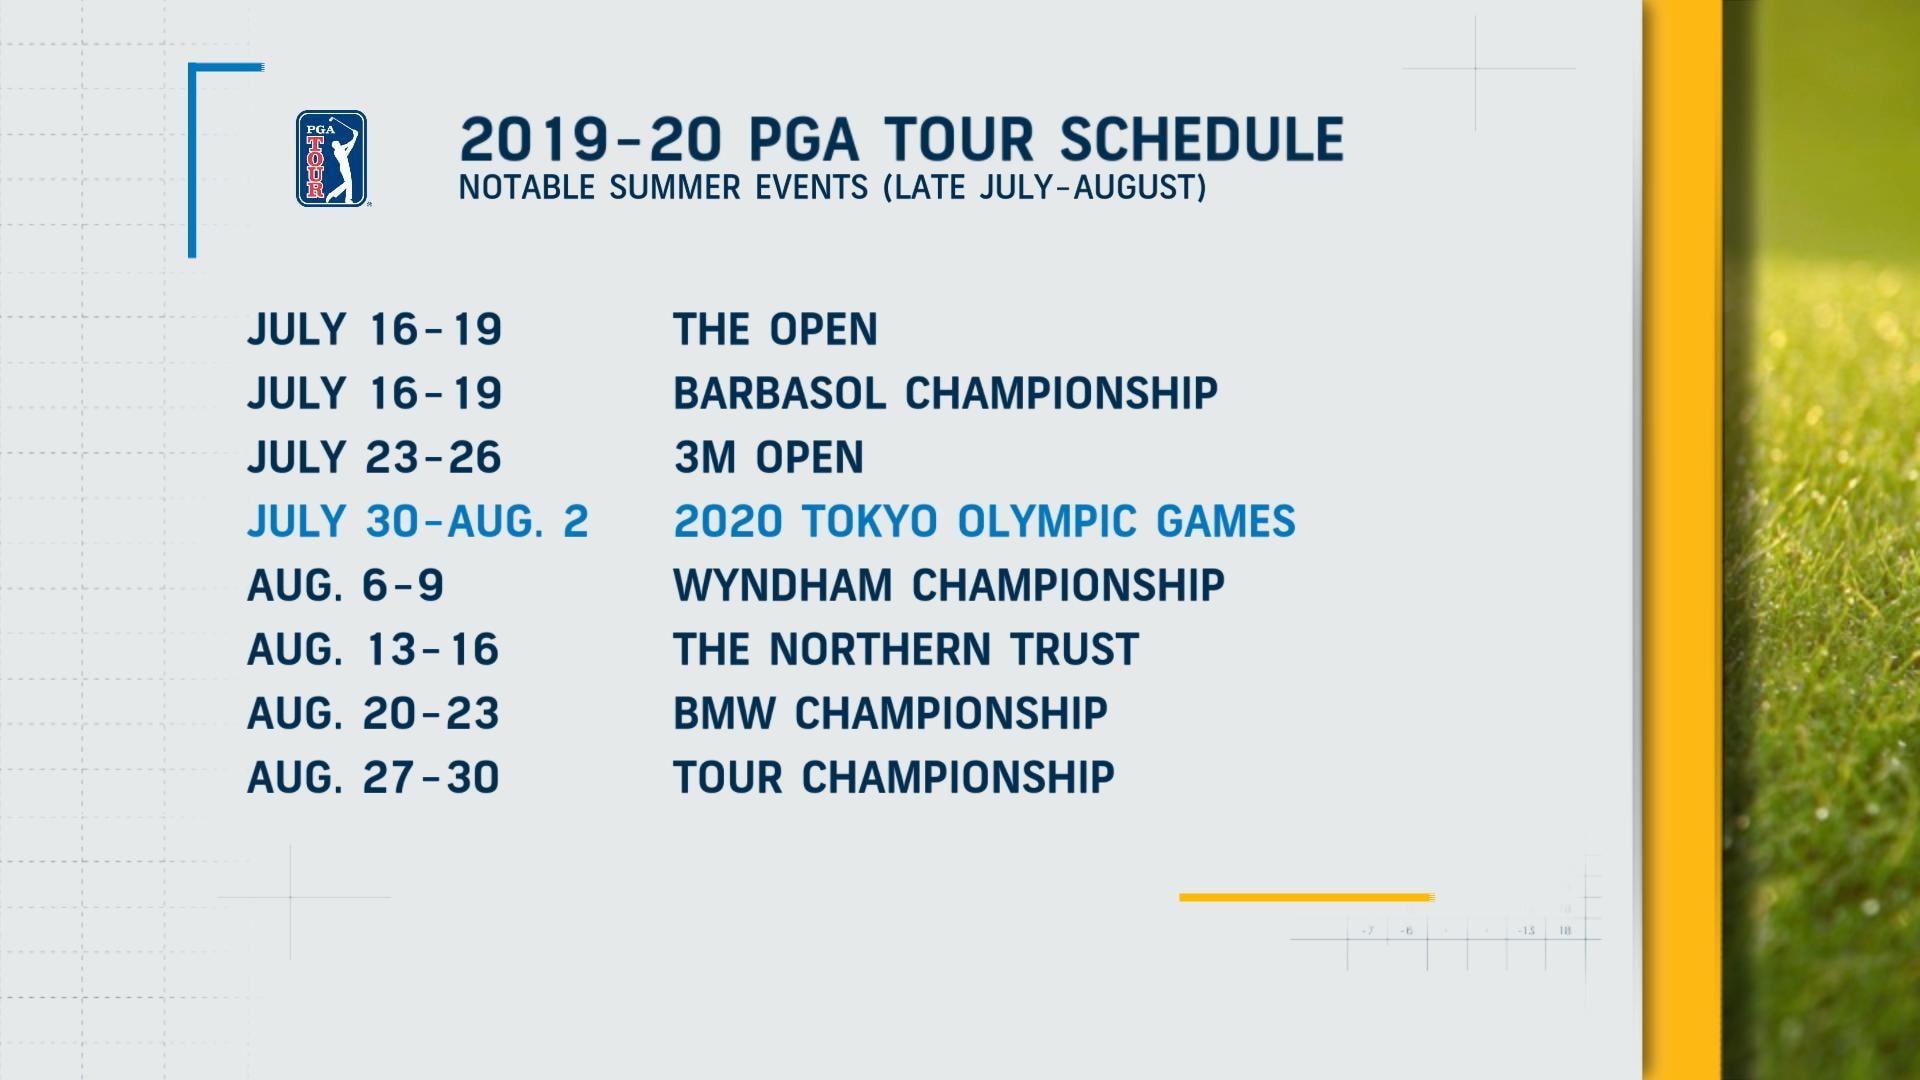 Pga Tour Dates 2020 2020 Tokyo Olympics Impacting PGA Tour Schedule | Golf Channel